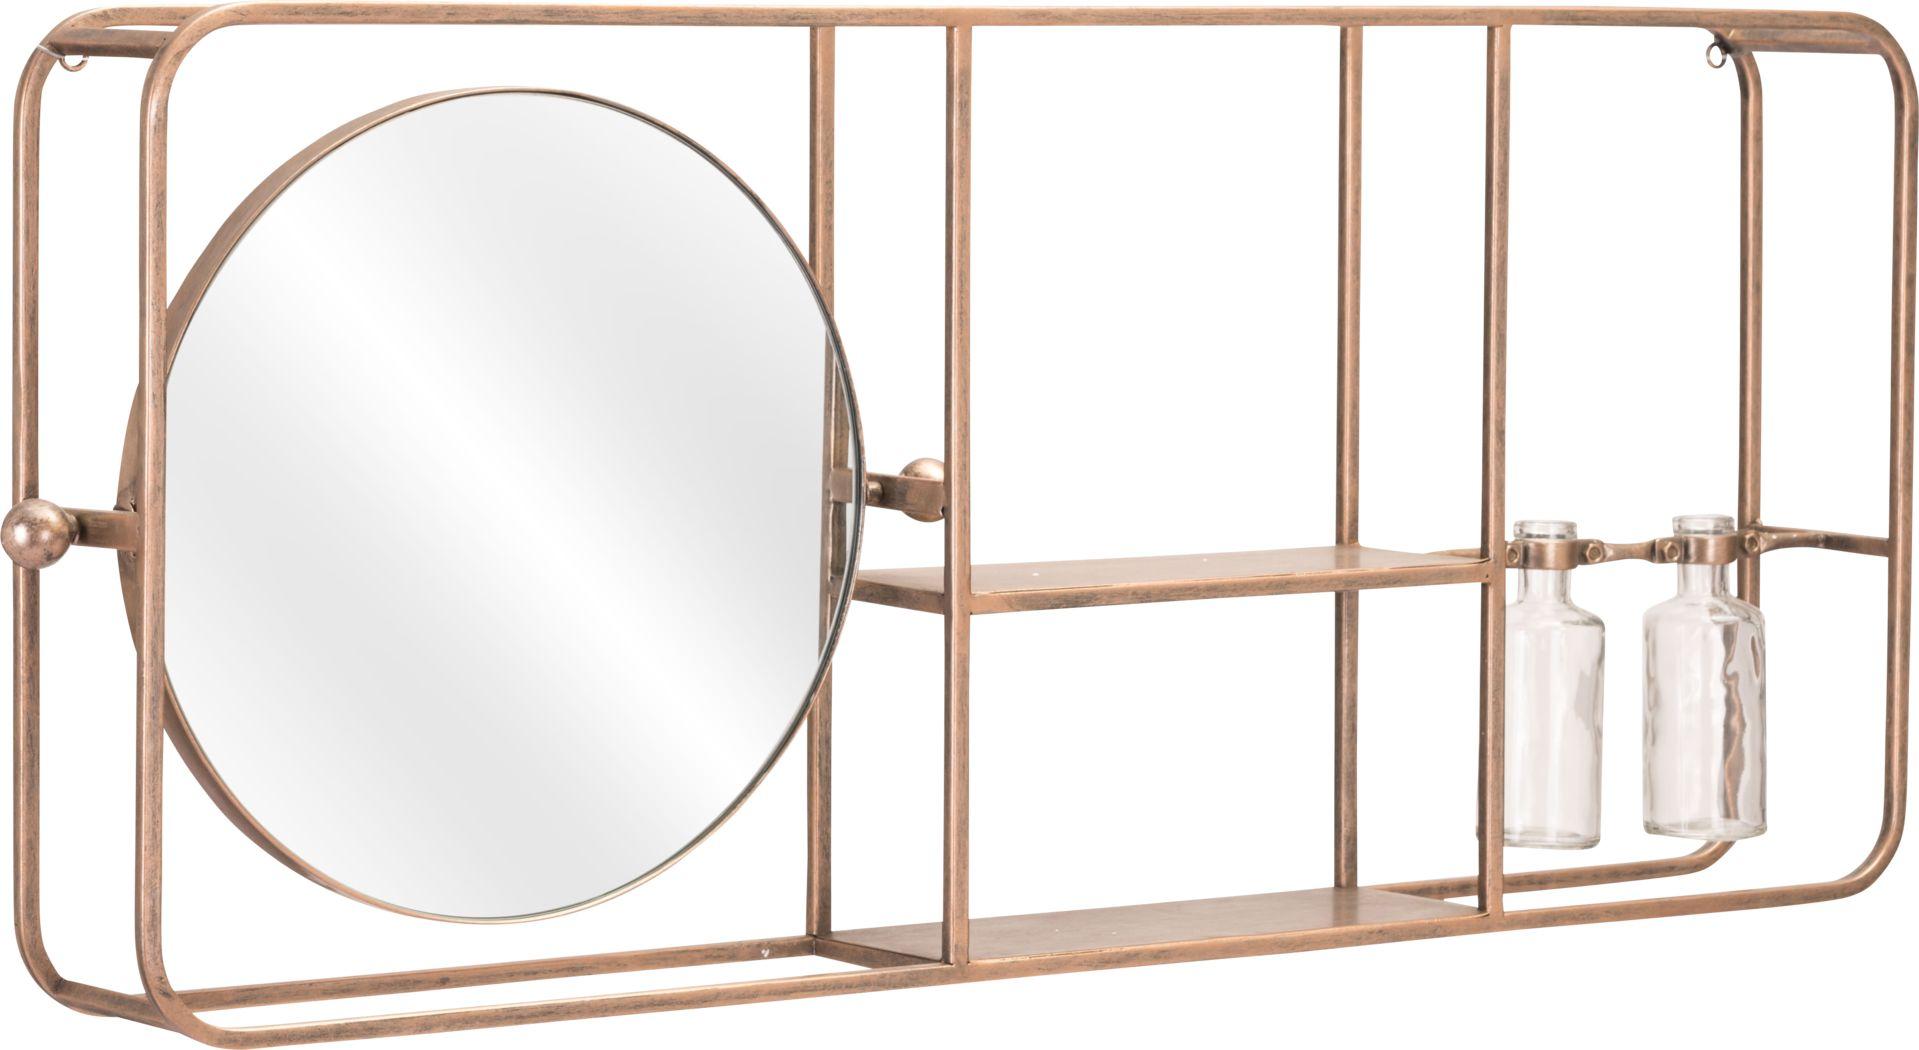 Bungalowe Gold Mirror